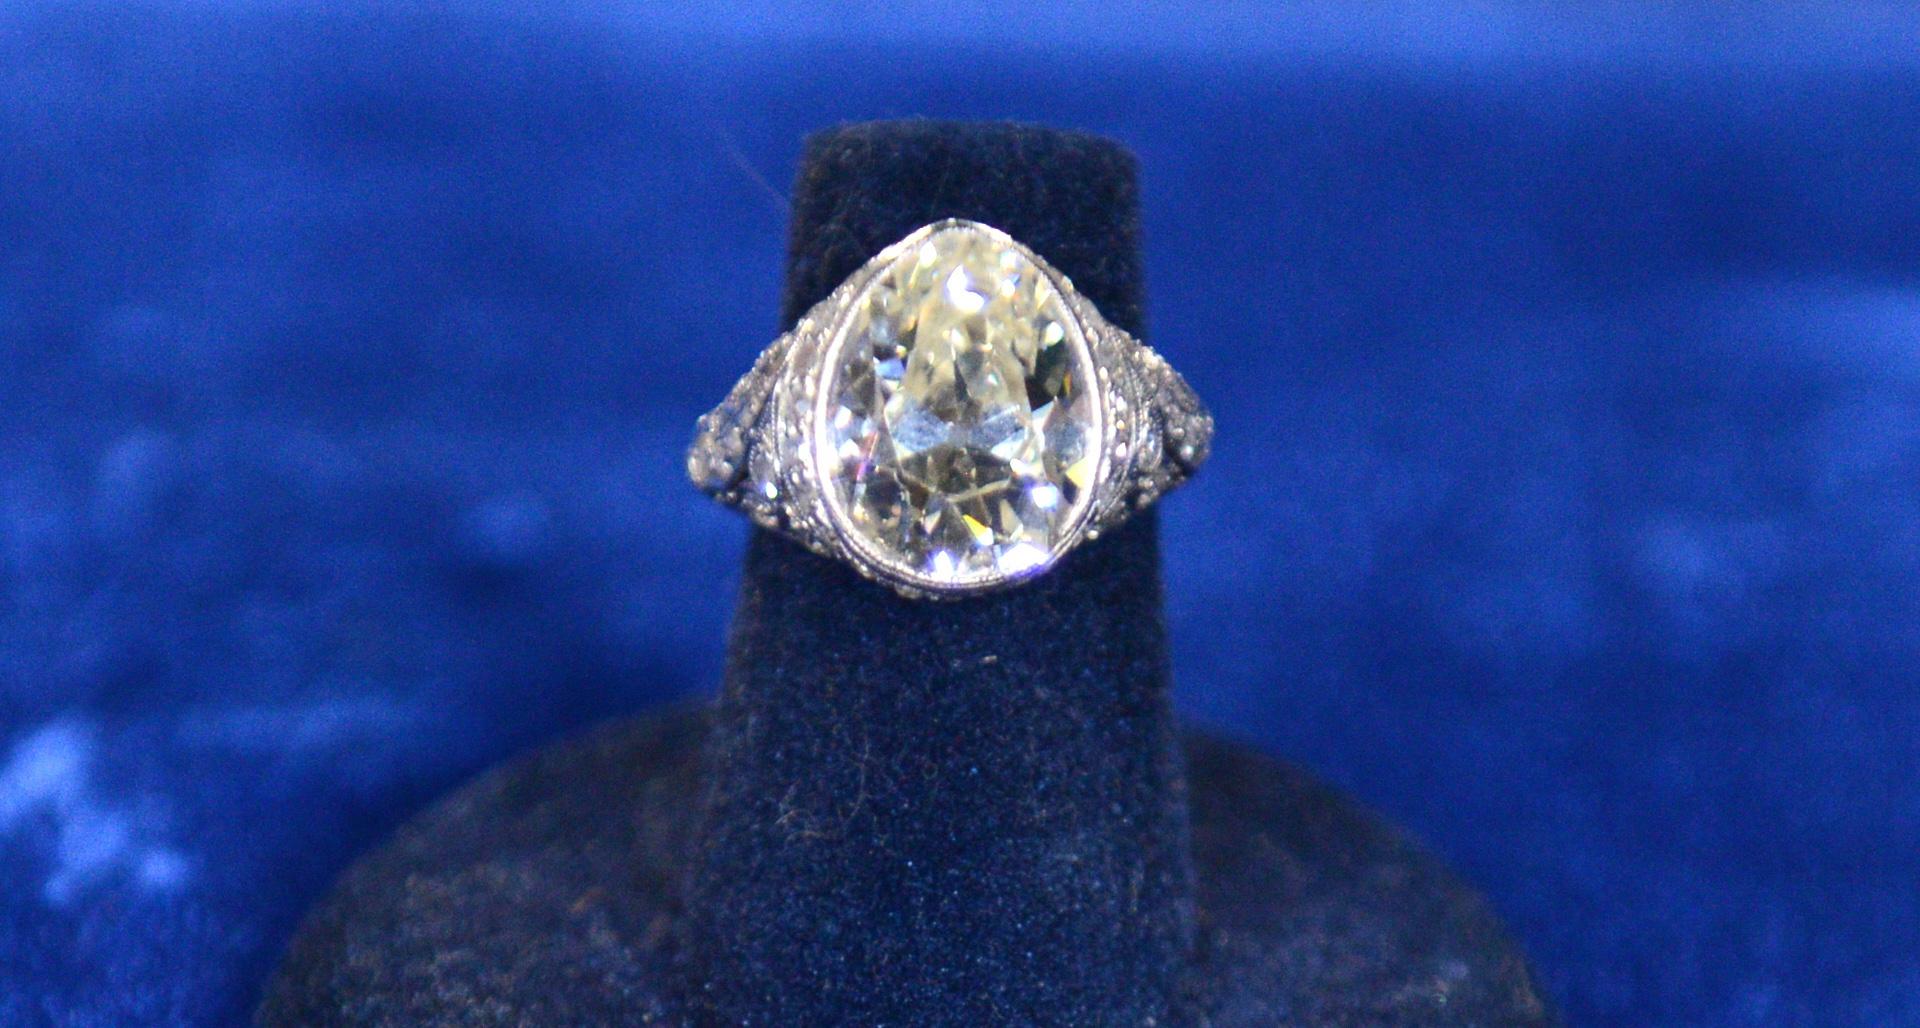 https://www-tc.pbs.org/prod-media/antiques-roadshow/article/images/diamond-engagment-ring.jpg